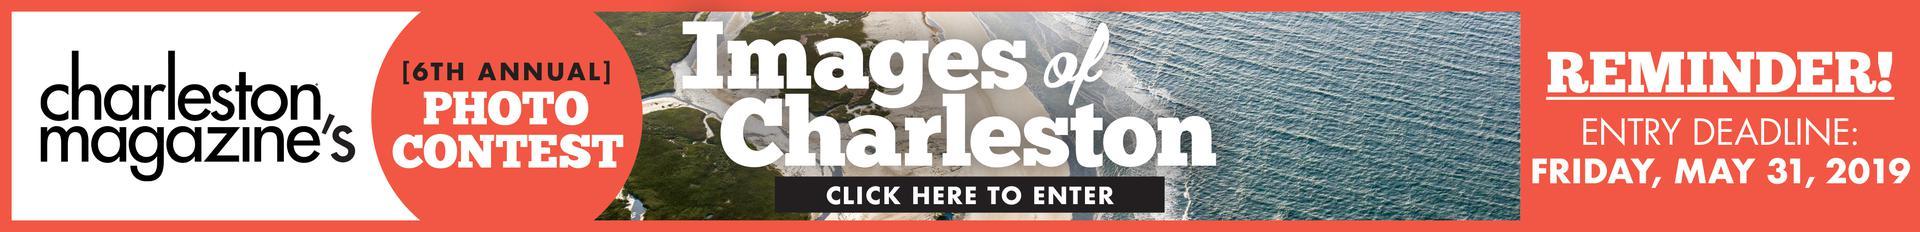 Charleston Magazine's 6th Annual Images of Charleston Photo Contest